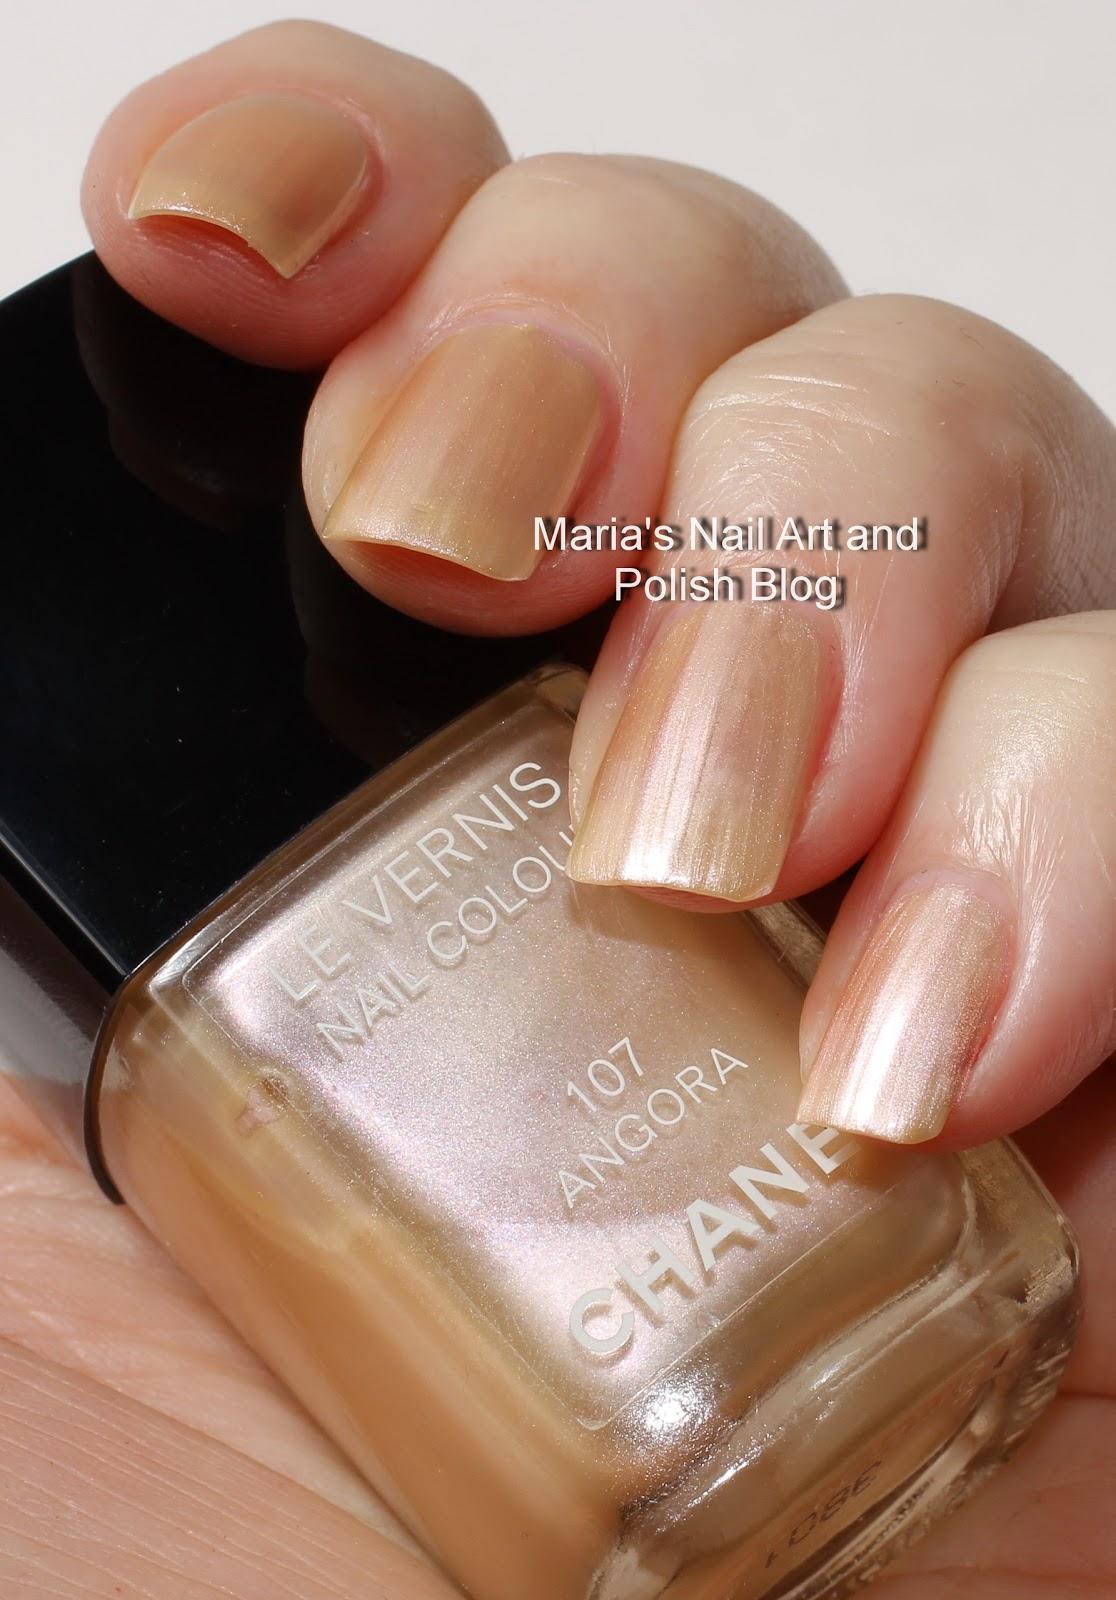 Marias Nail Art and Polish Blog: Chanel Angora 107 swatches - vintage